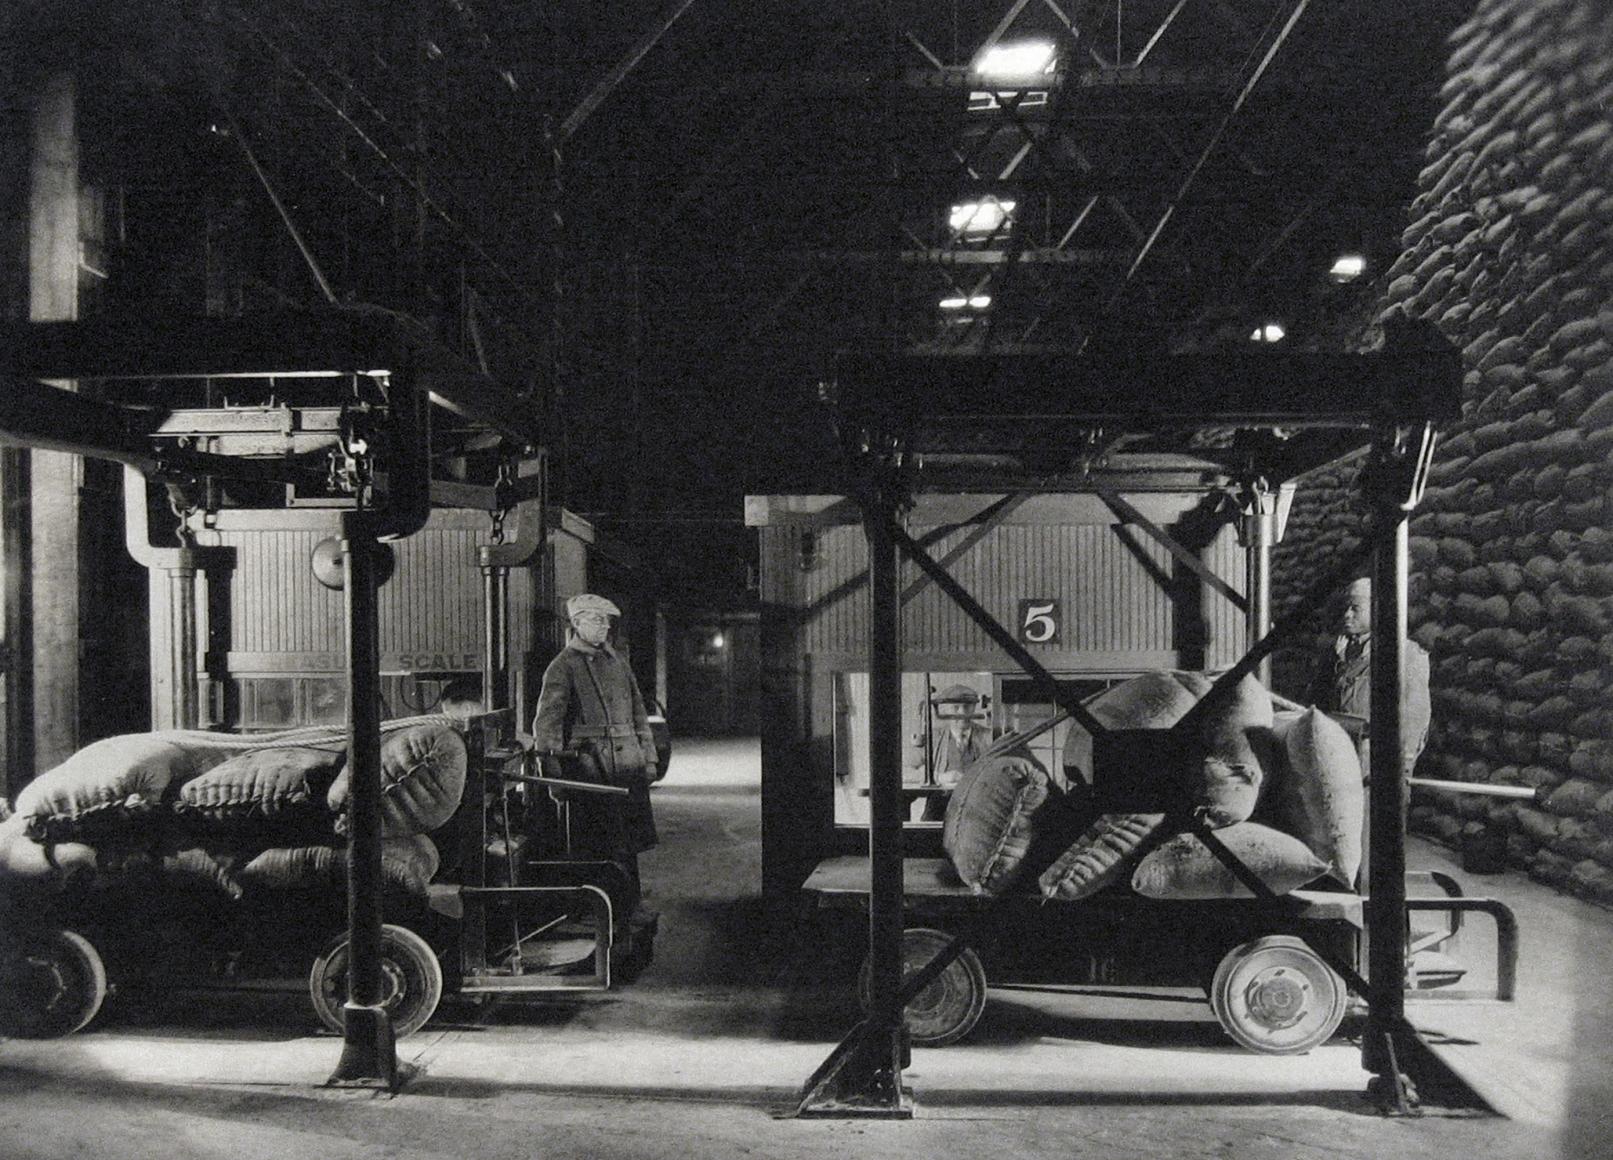 Harold Haliday Costain, Edgewater, NJ Sugar Refinery, 1935. Two men load sugar sacks onto carts.